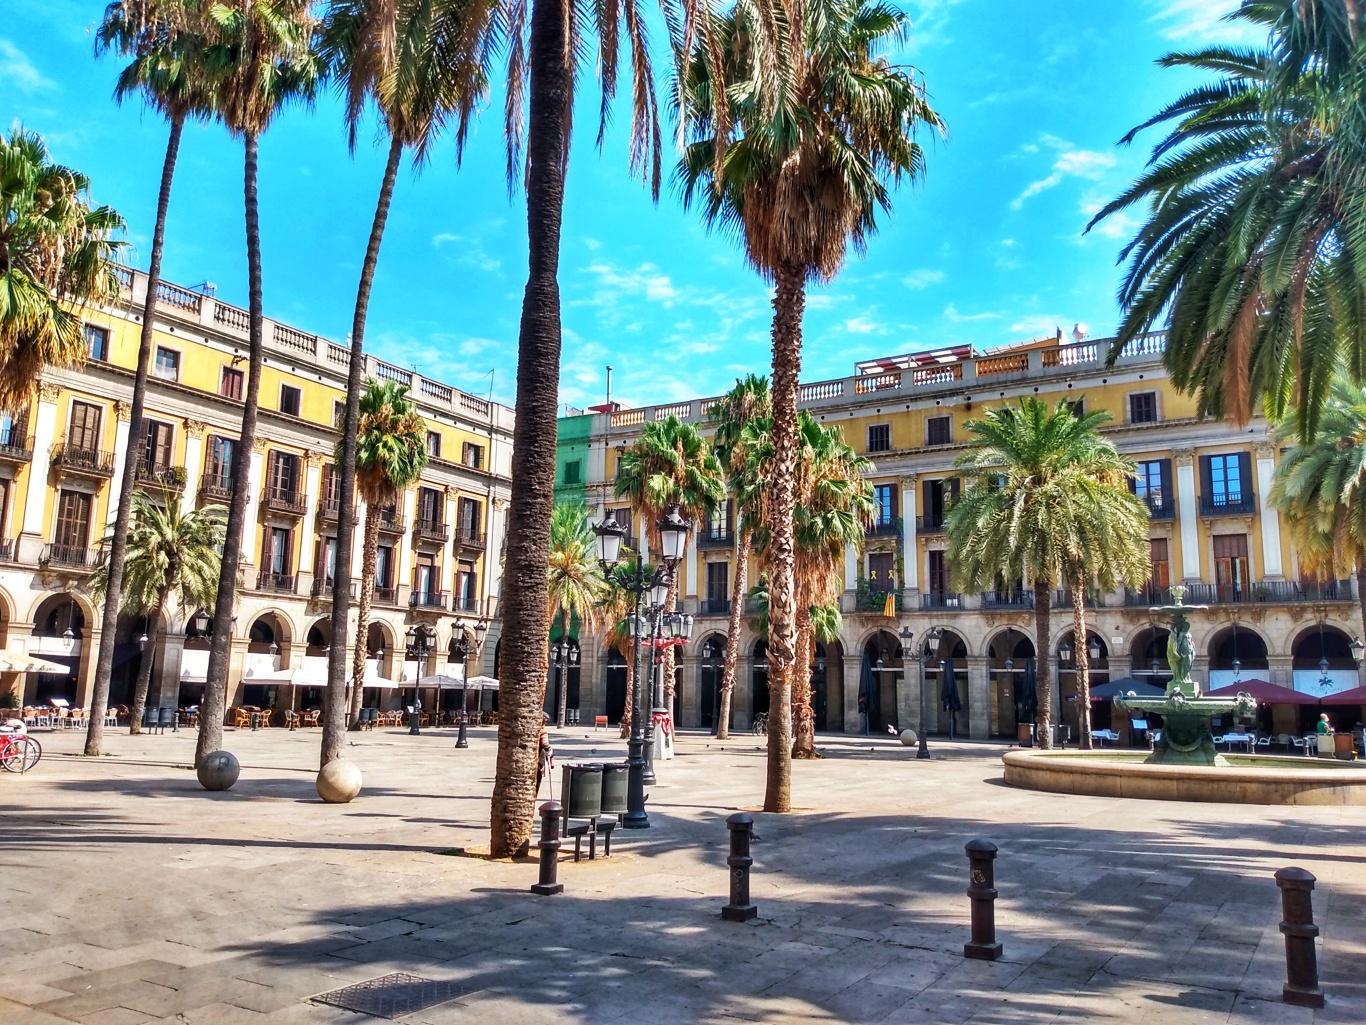 How To Use The Spanish Future Tense Convospanish